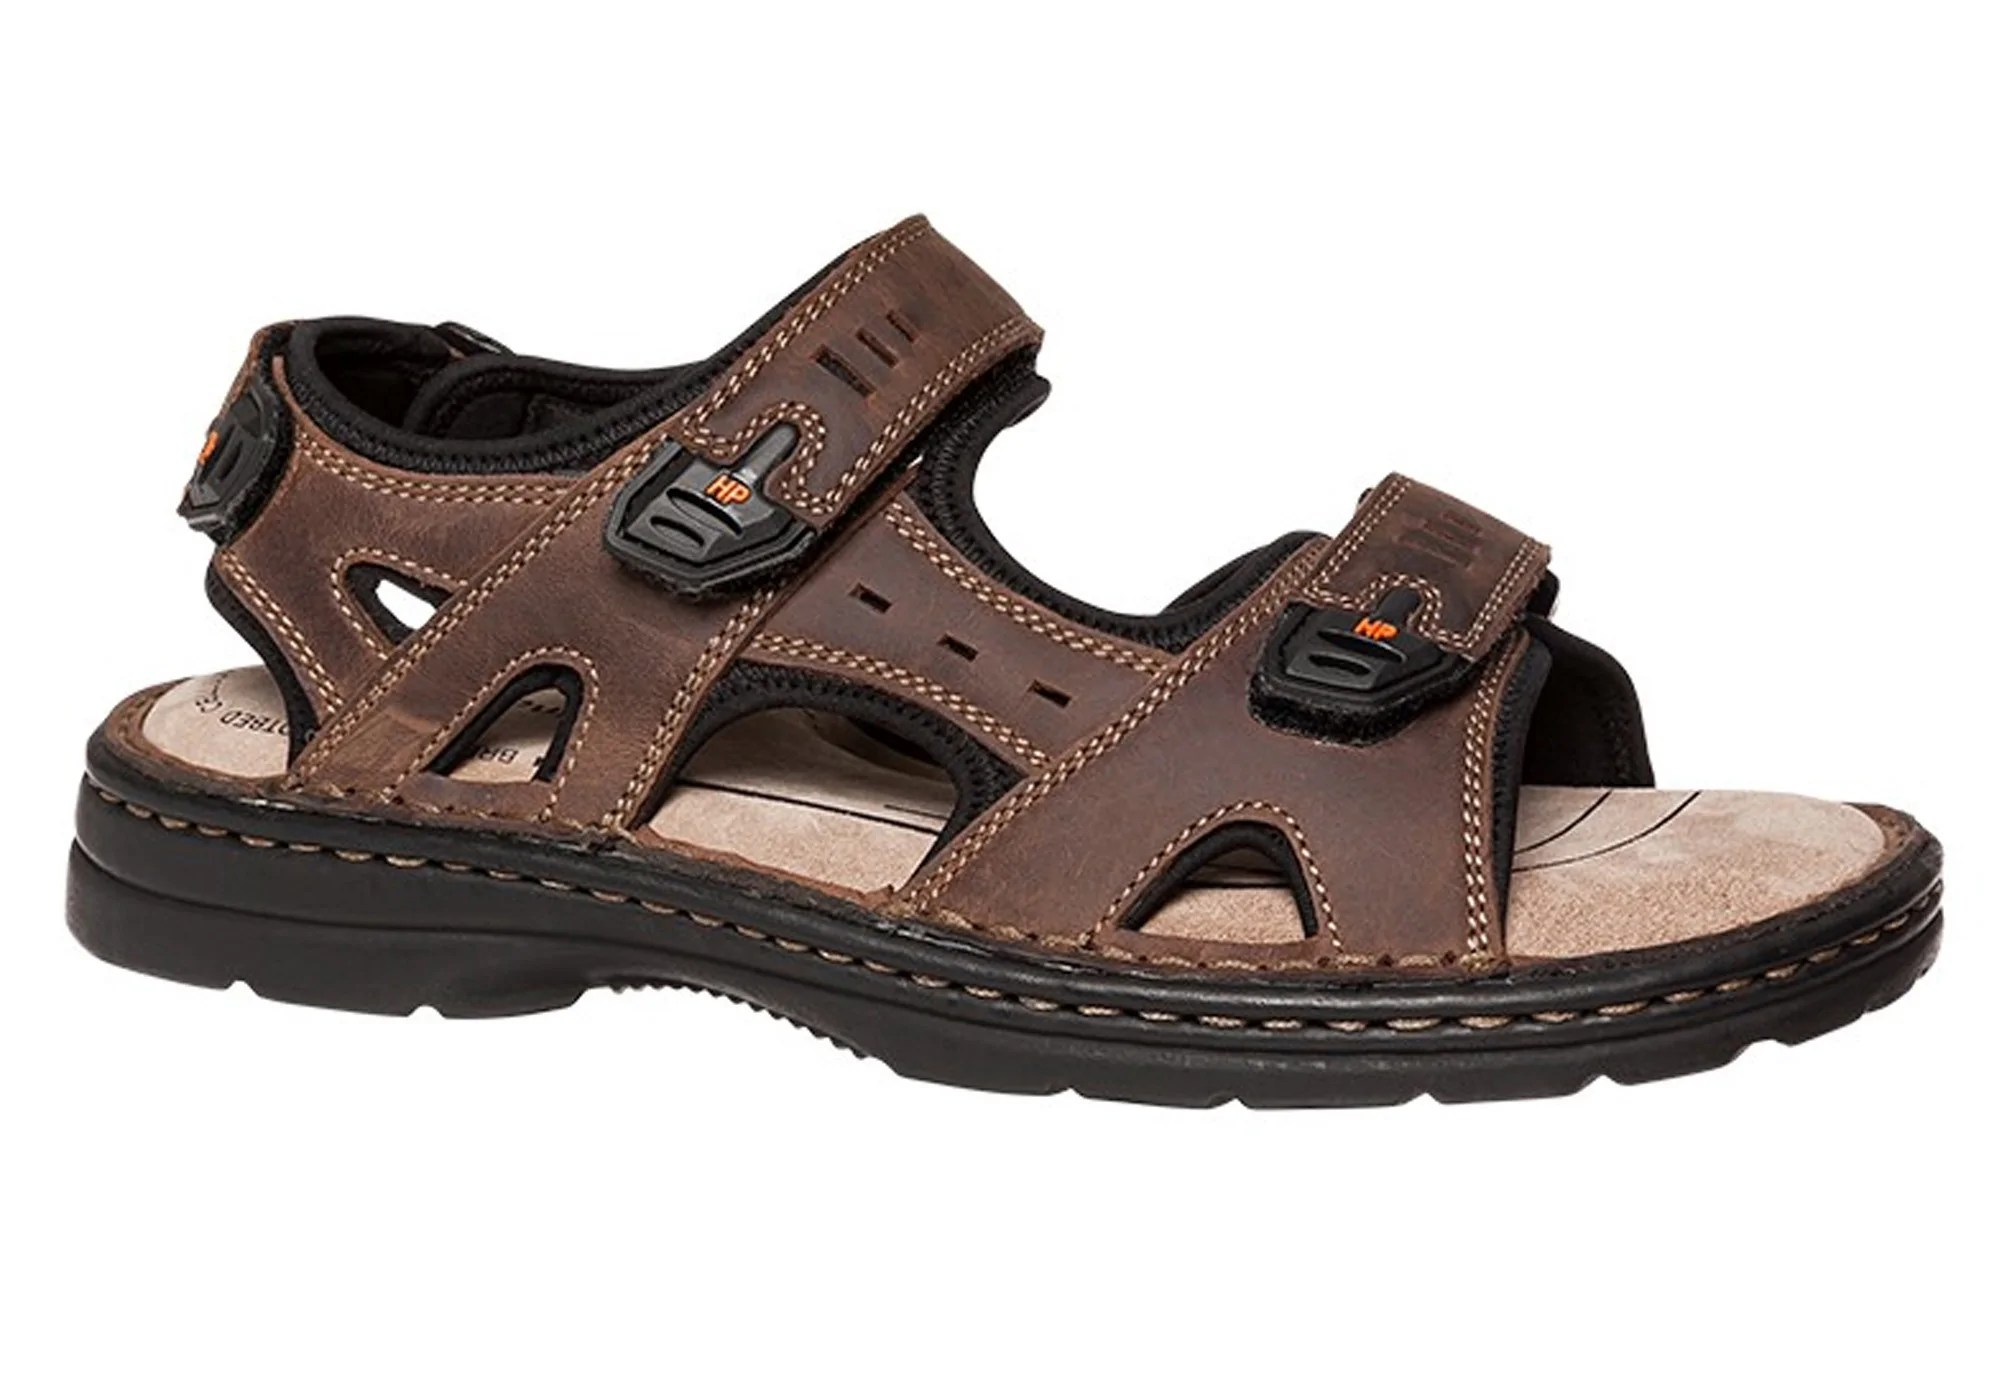 Hush Puppies Simmer Mens Wide Fit Sandals Lightweight Adjustable Comfortable